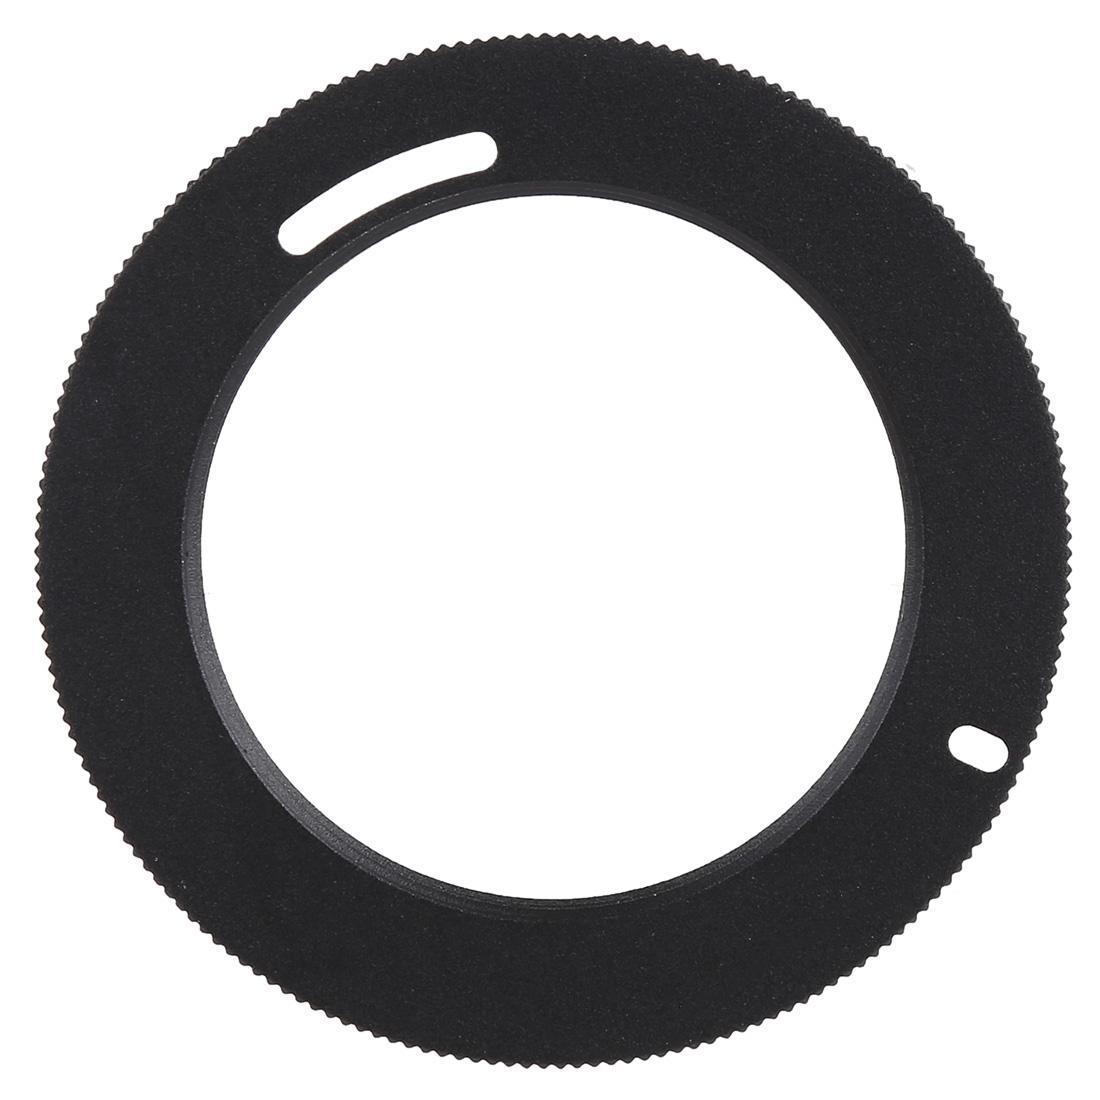 M42-M42 PK Lens pour PK Mount Adapter métal Stepping Anneau